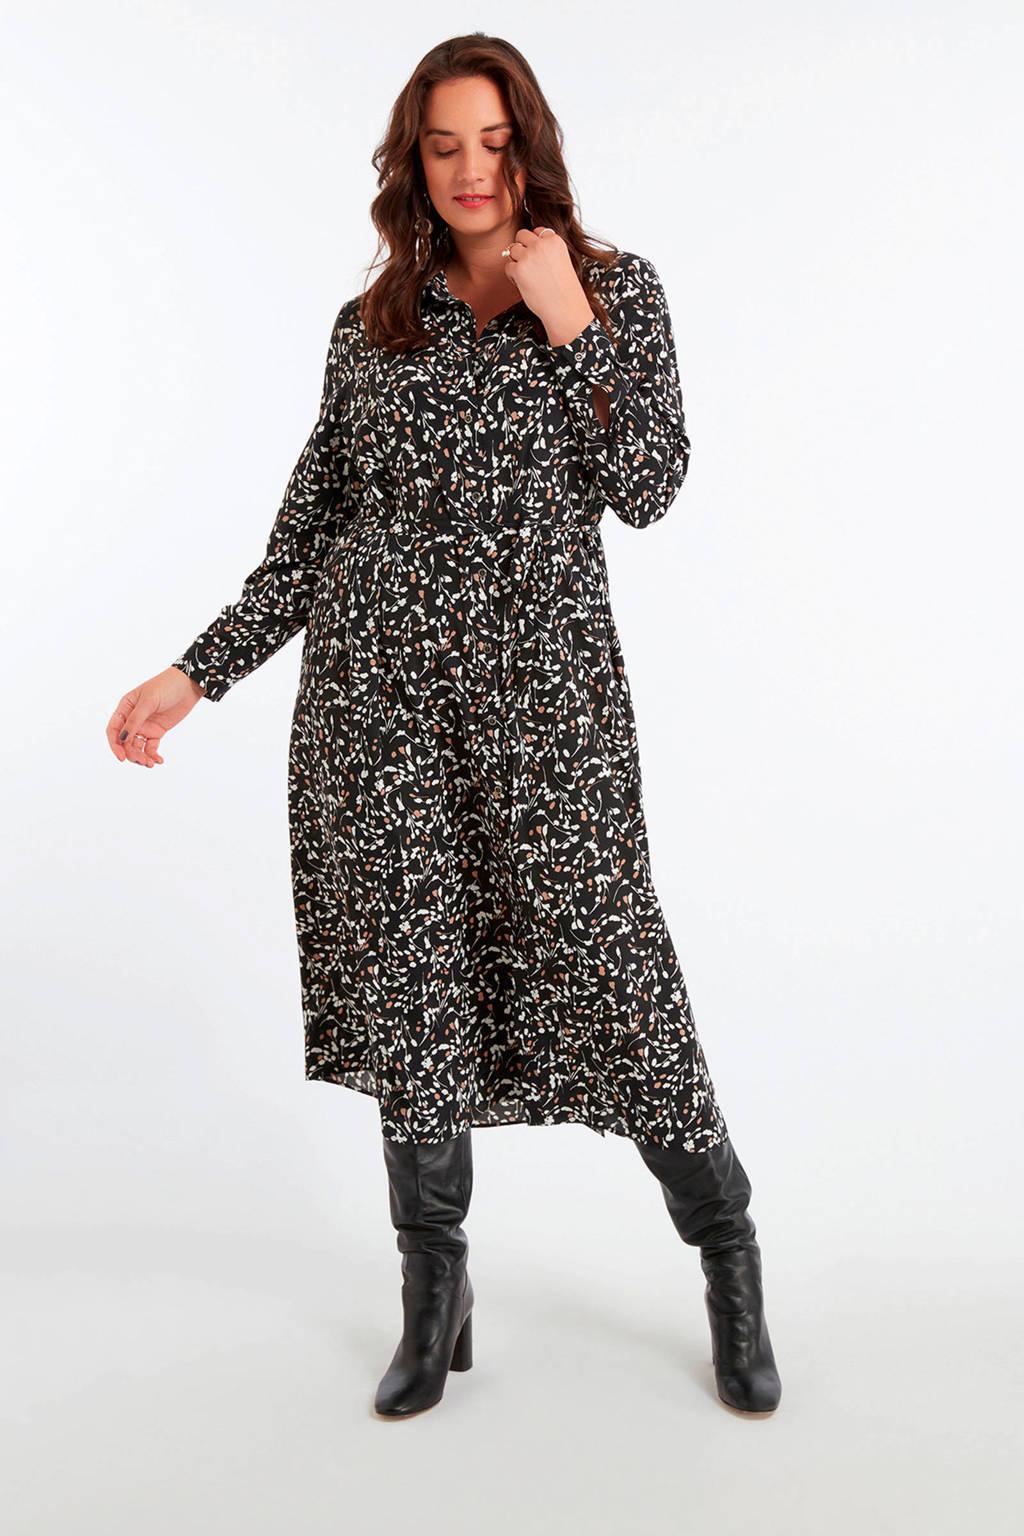 MS Mode gebloemde blousejurk zwart/multi, Zwart/multi